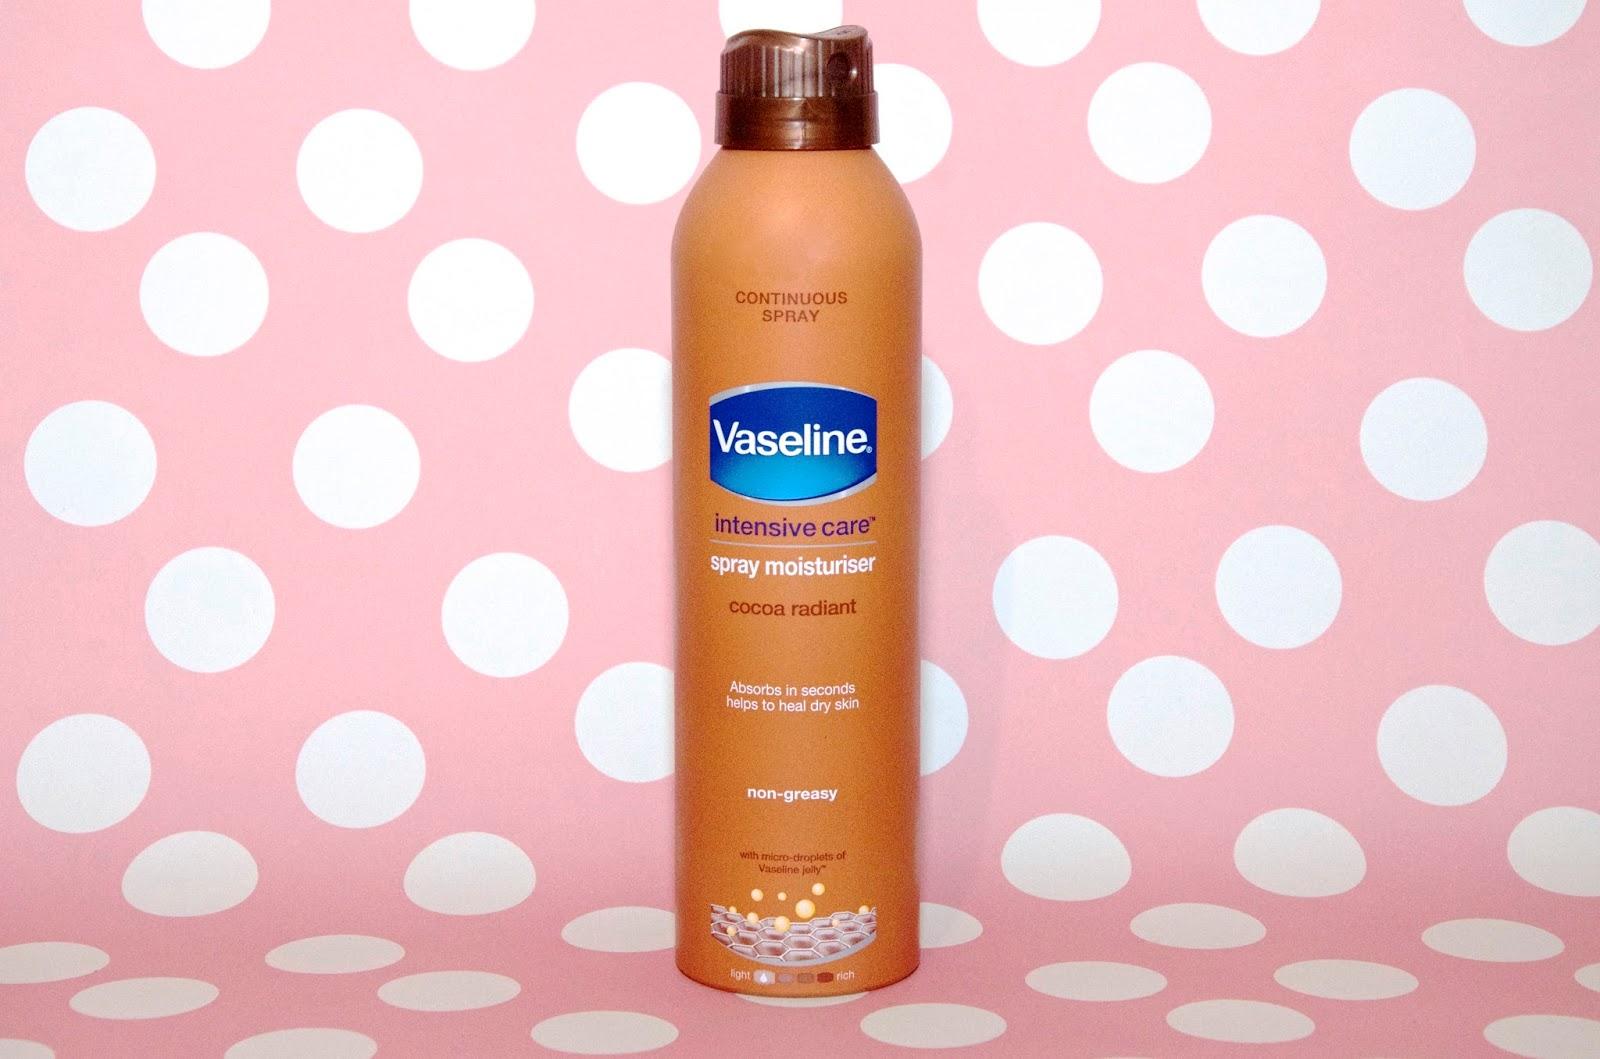 Vaseline Intensive Care Spray Moisturiser in Cocoa Radiant